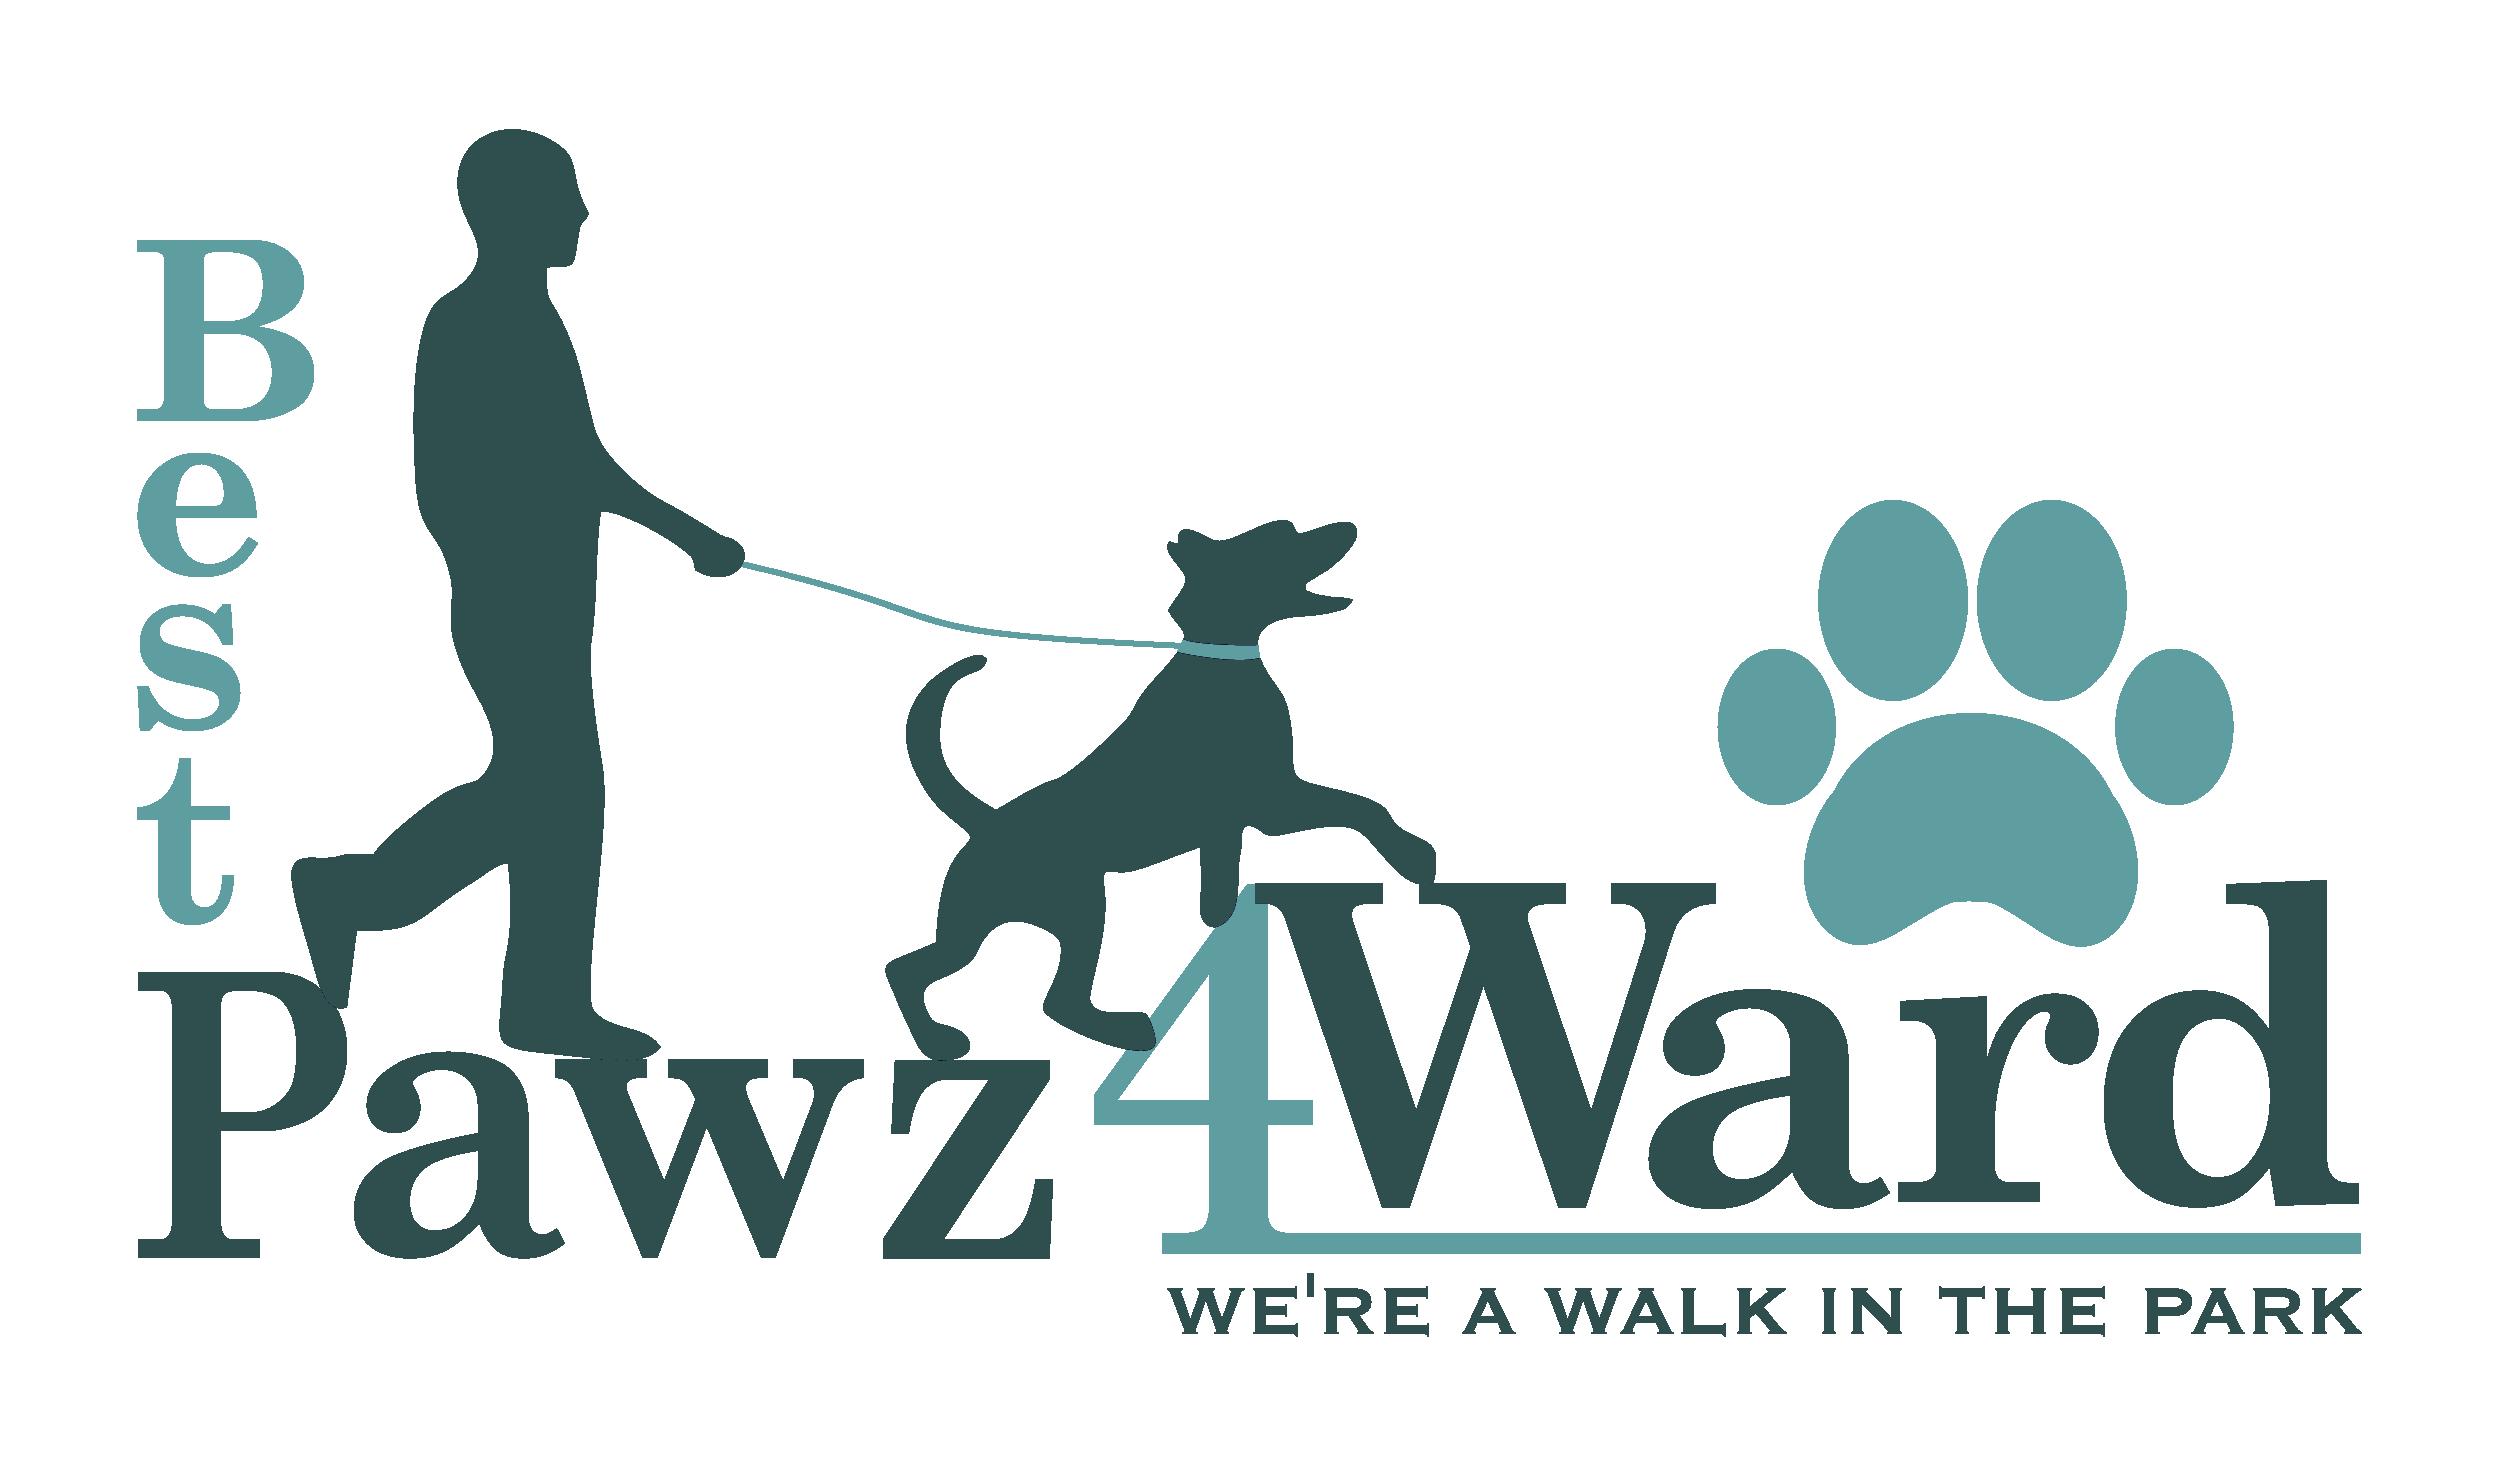 Best Pawz 4Ward